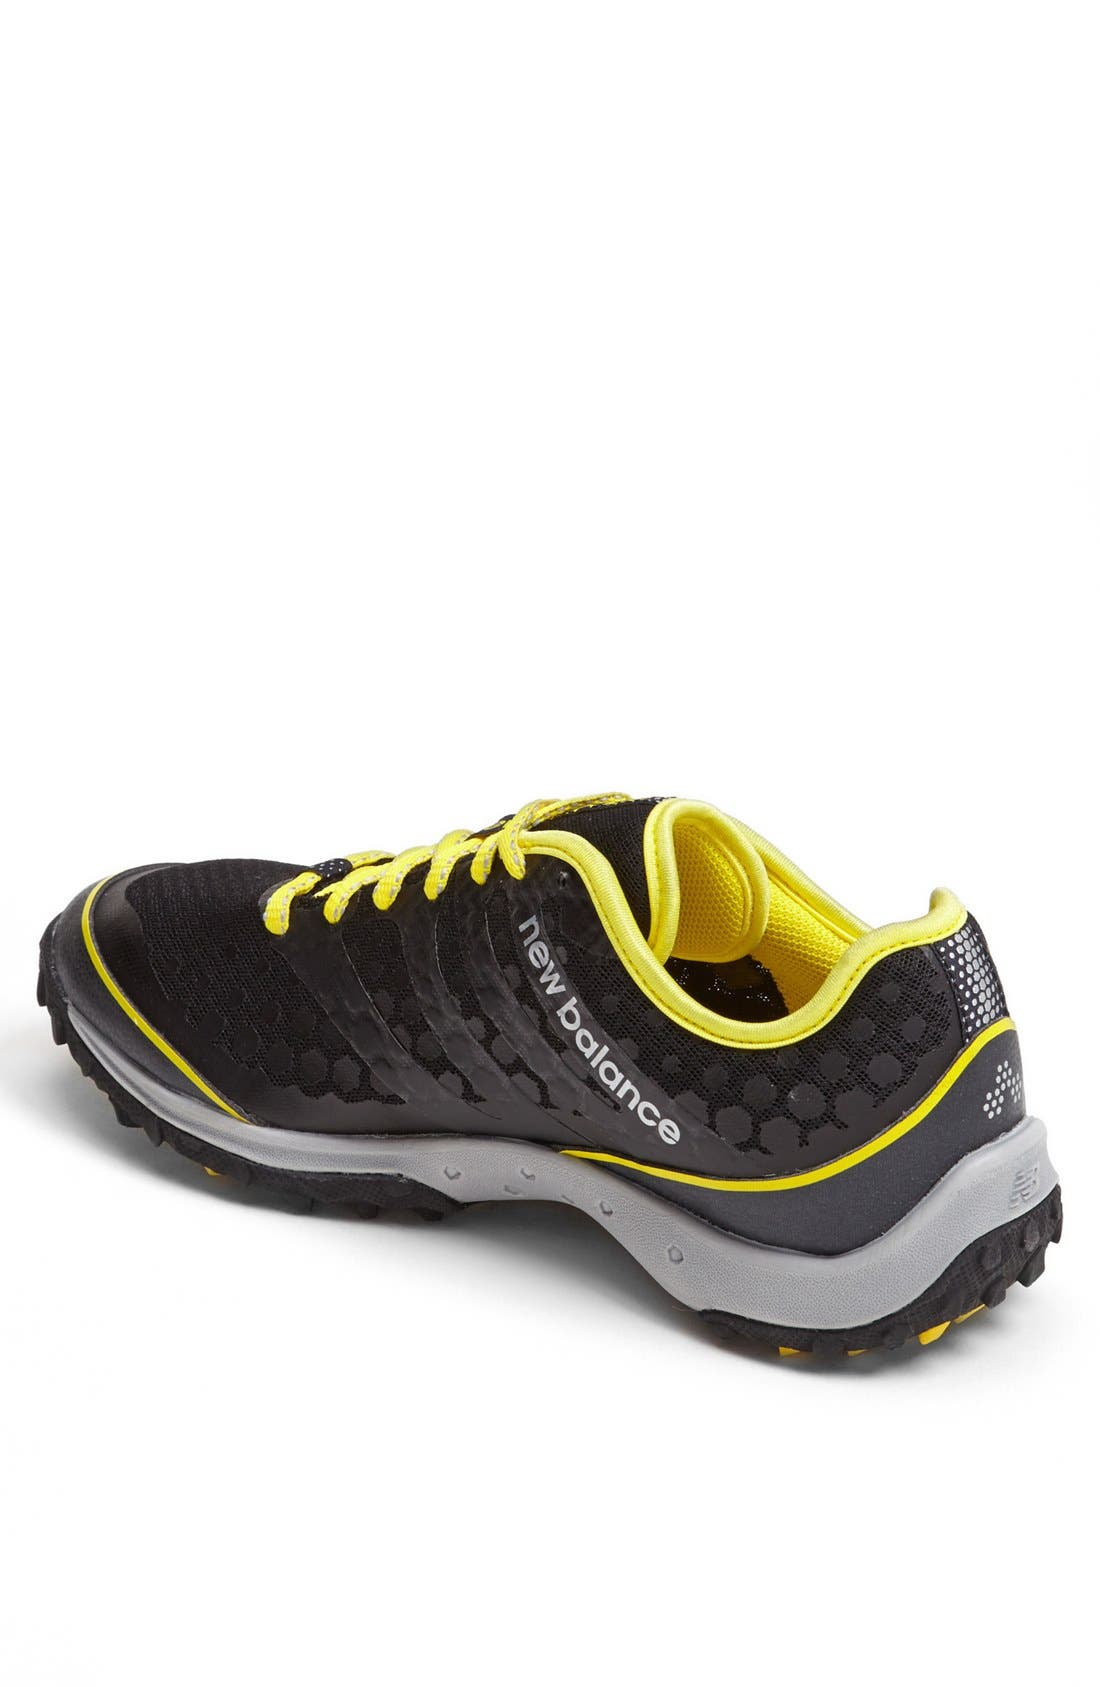 Alternate Image 2  - New Balance 'Minimus 1690' Trail Running Shoe (Men)